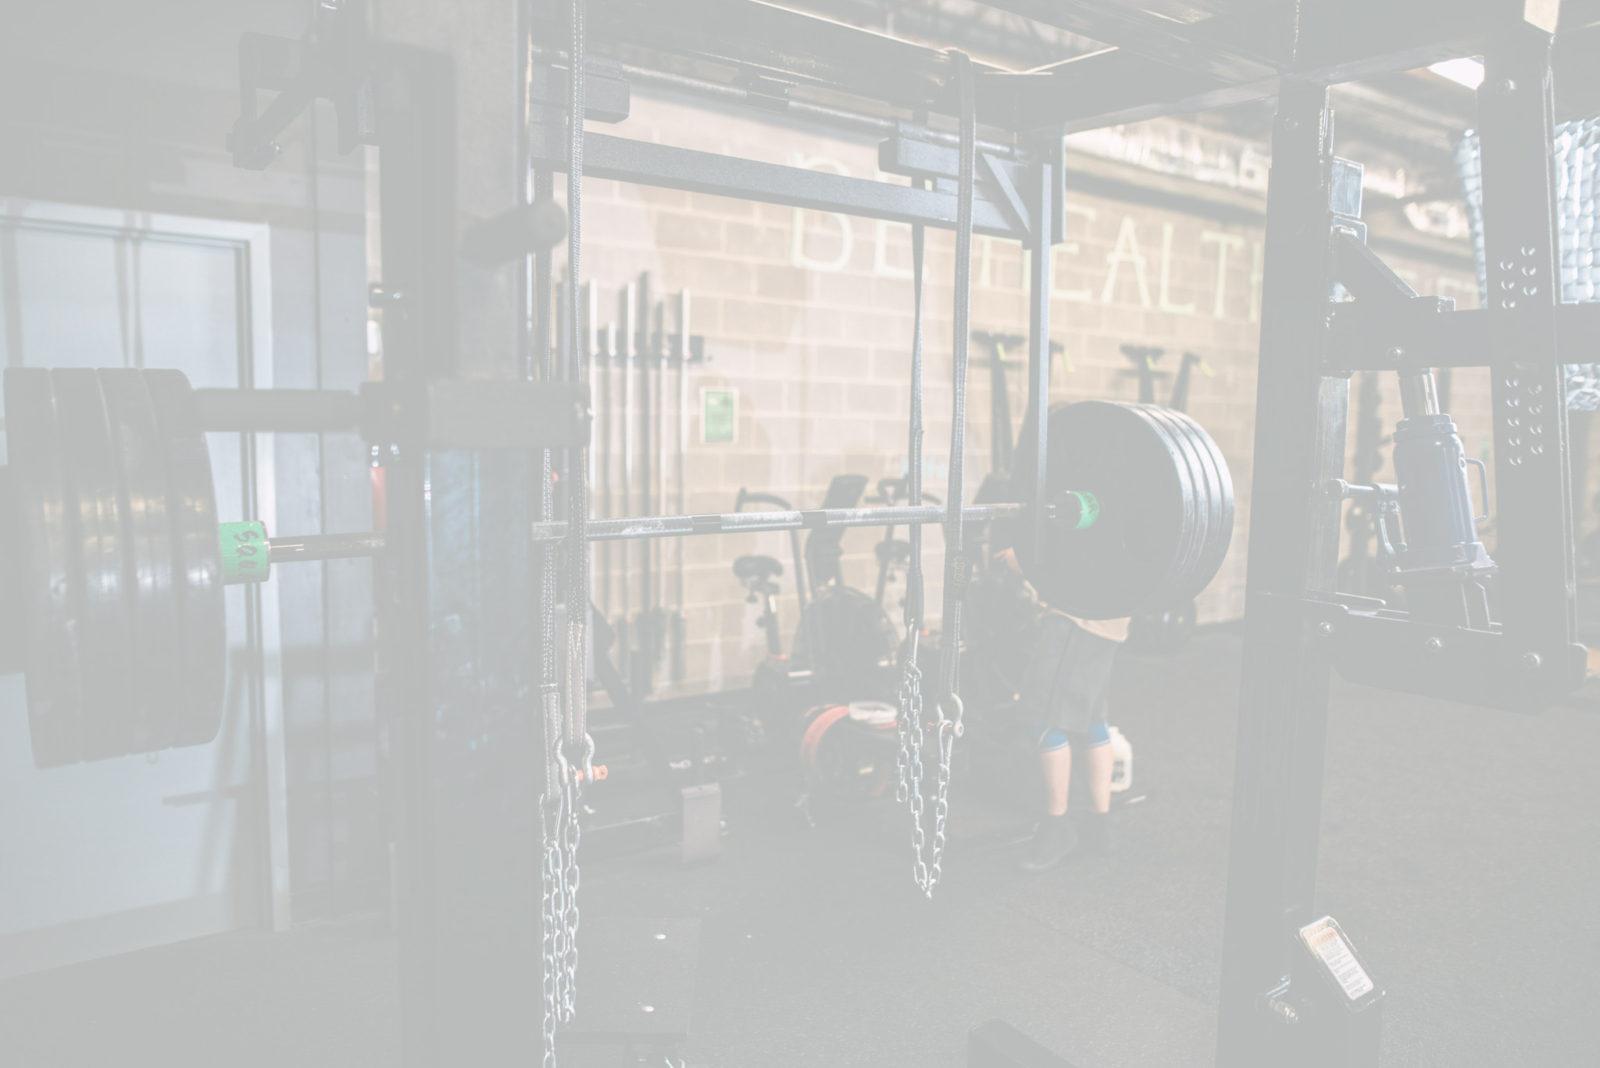 Iron Syndicate Barbell - image Monster-Squat-2 on https://ironforgedfitness.com